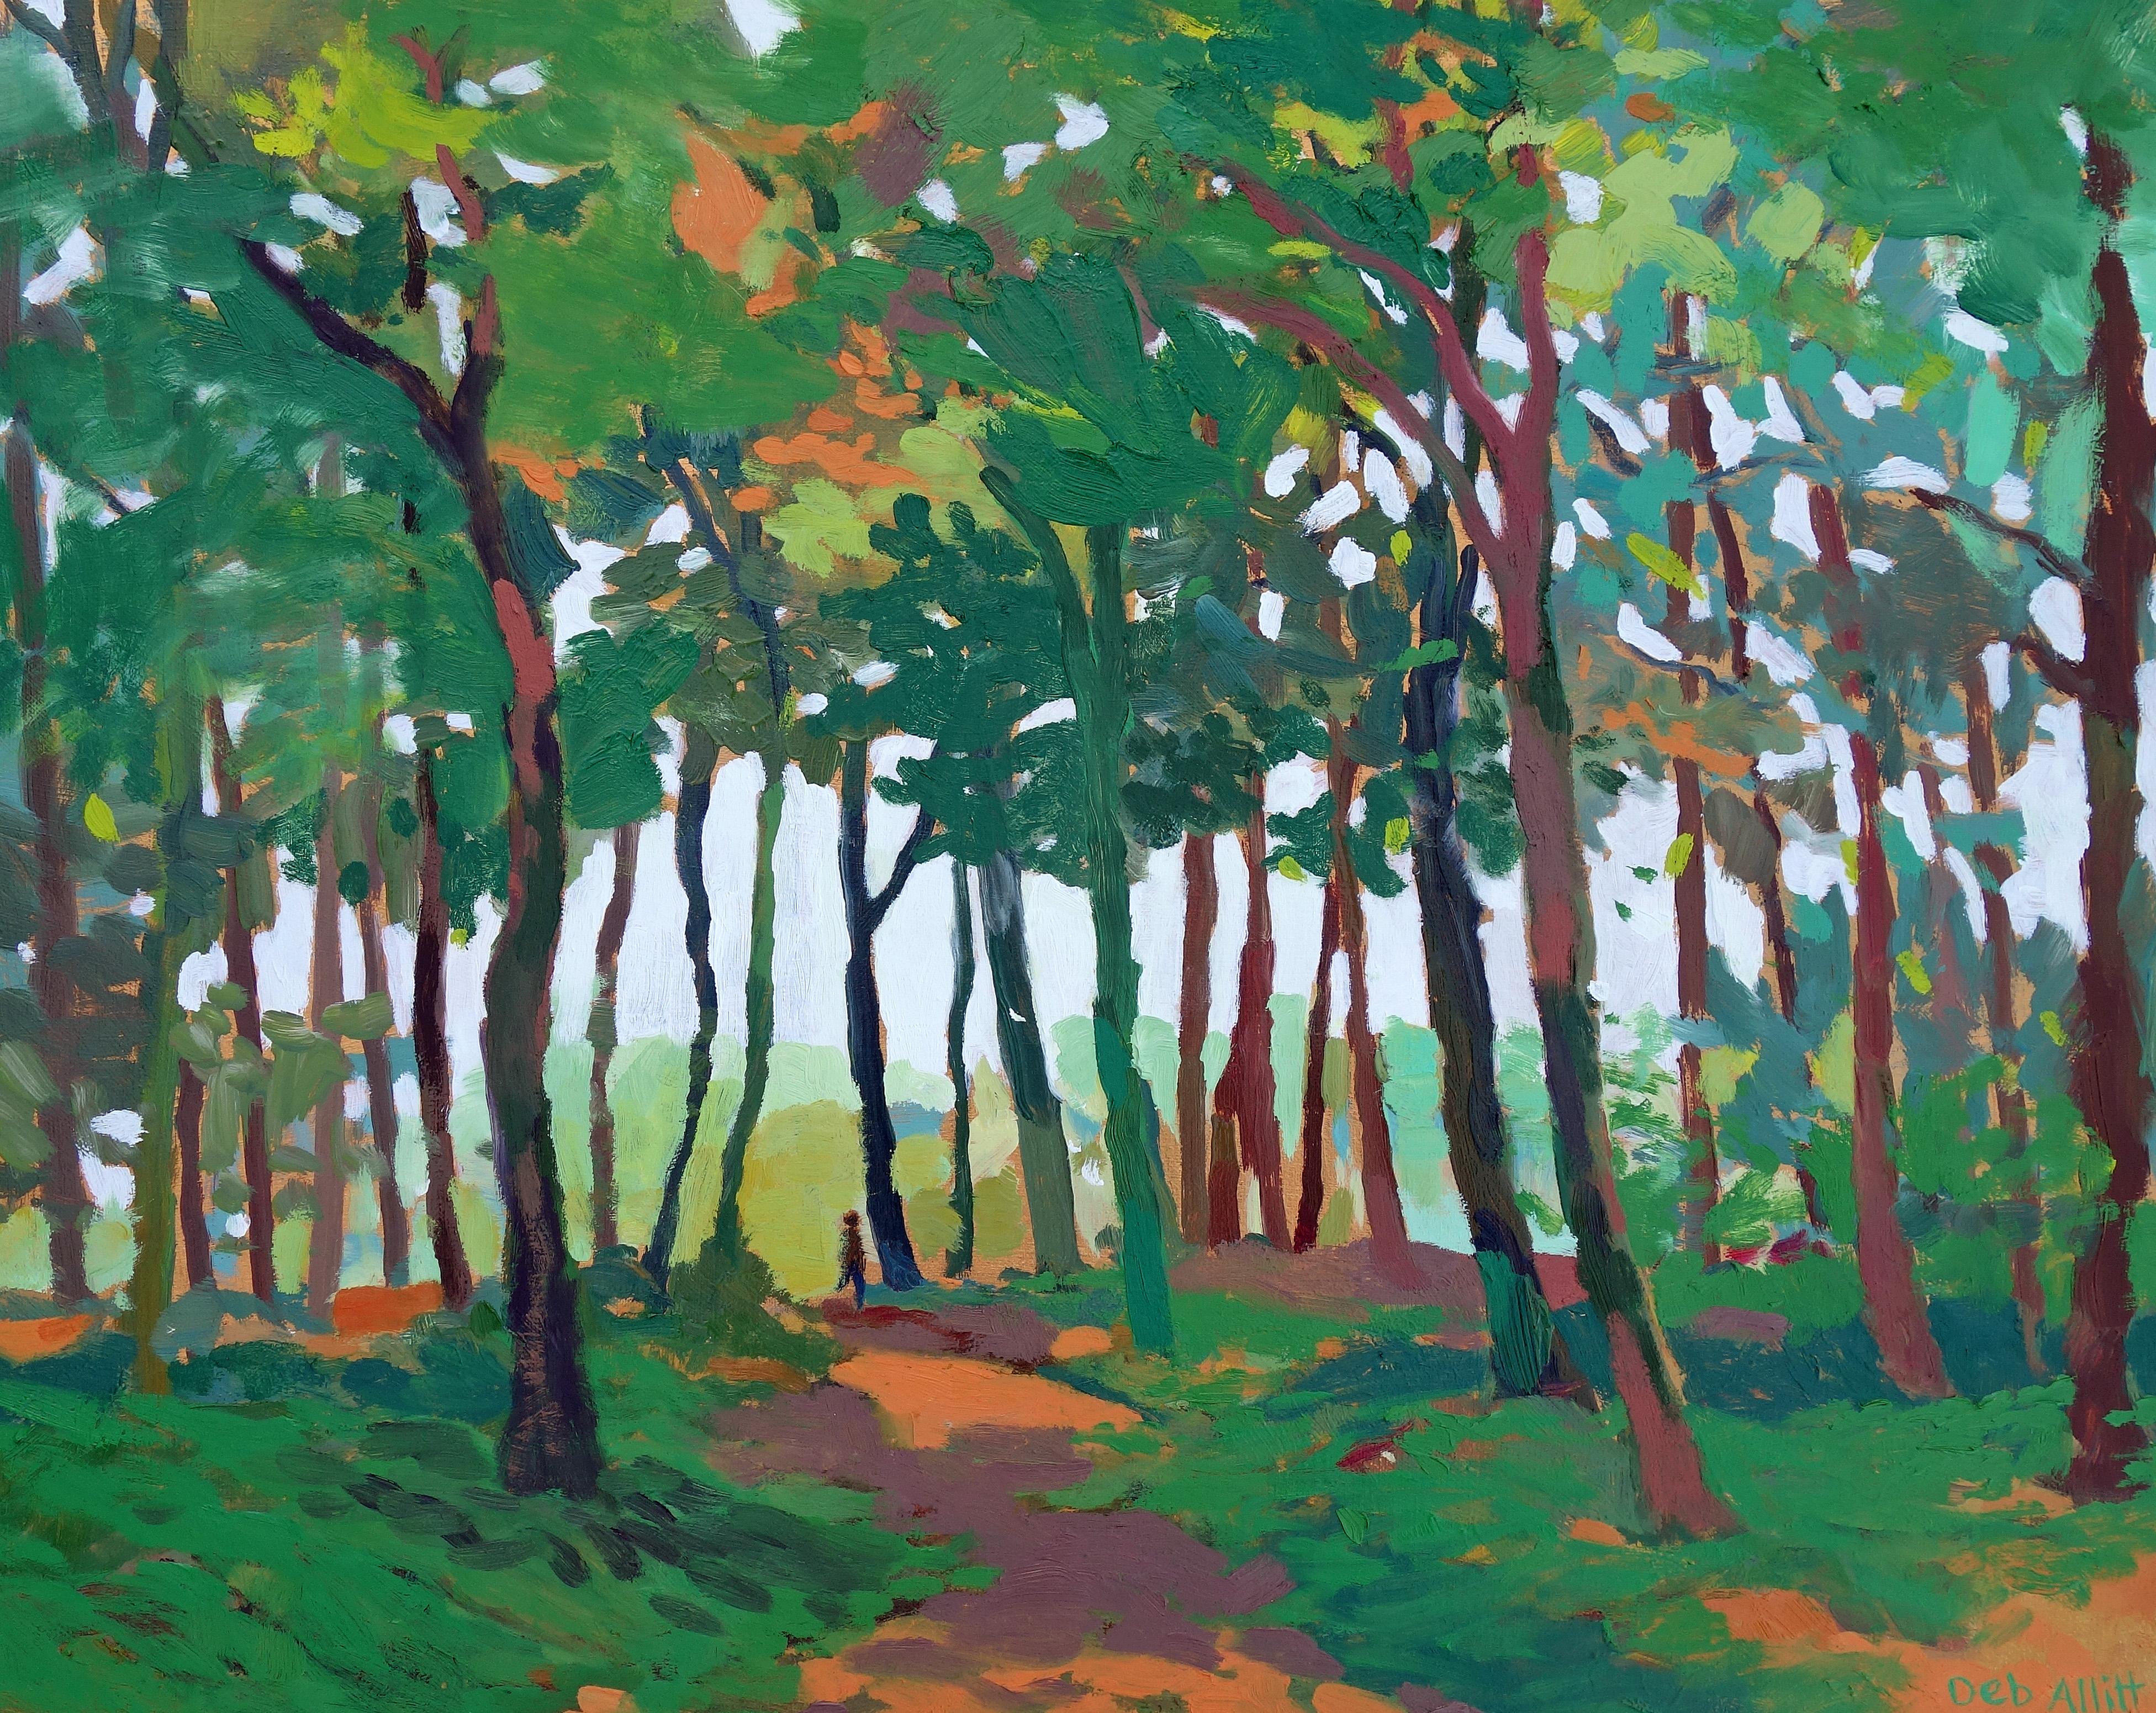 Looking Towards the Light, Osmaston Woods. Oil on canvas. 40 x 50 cm.